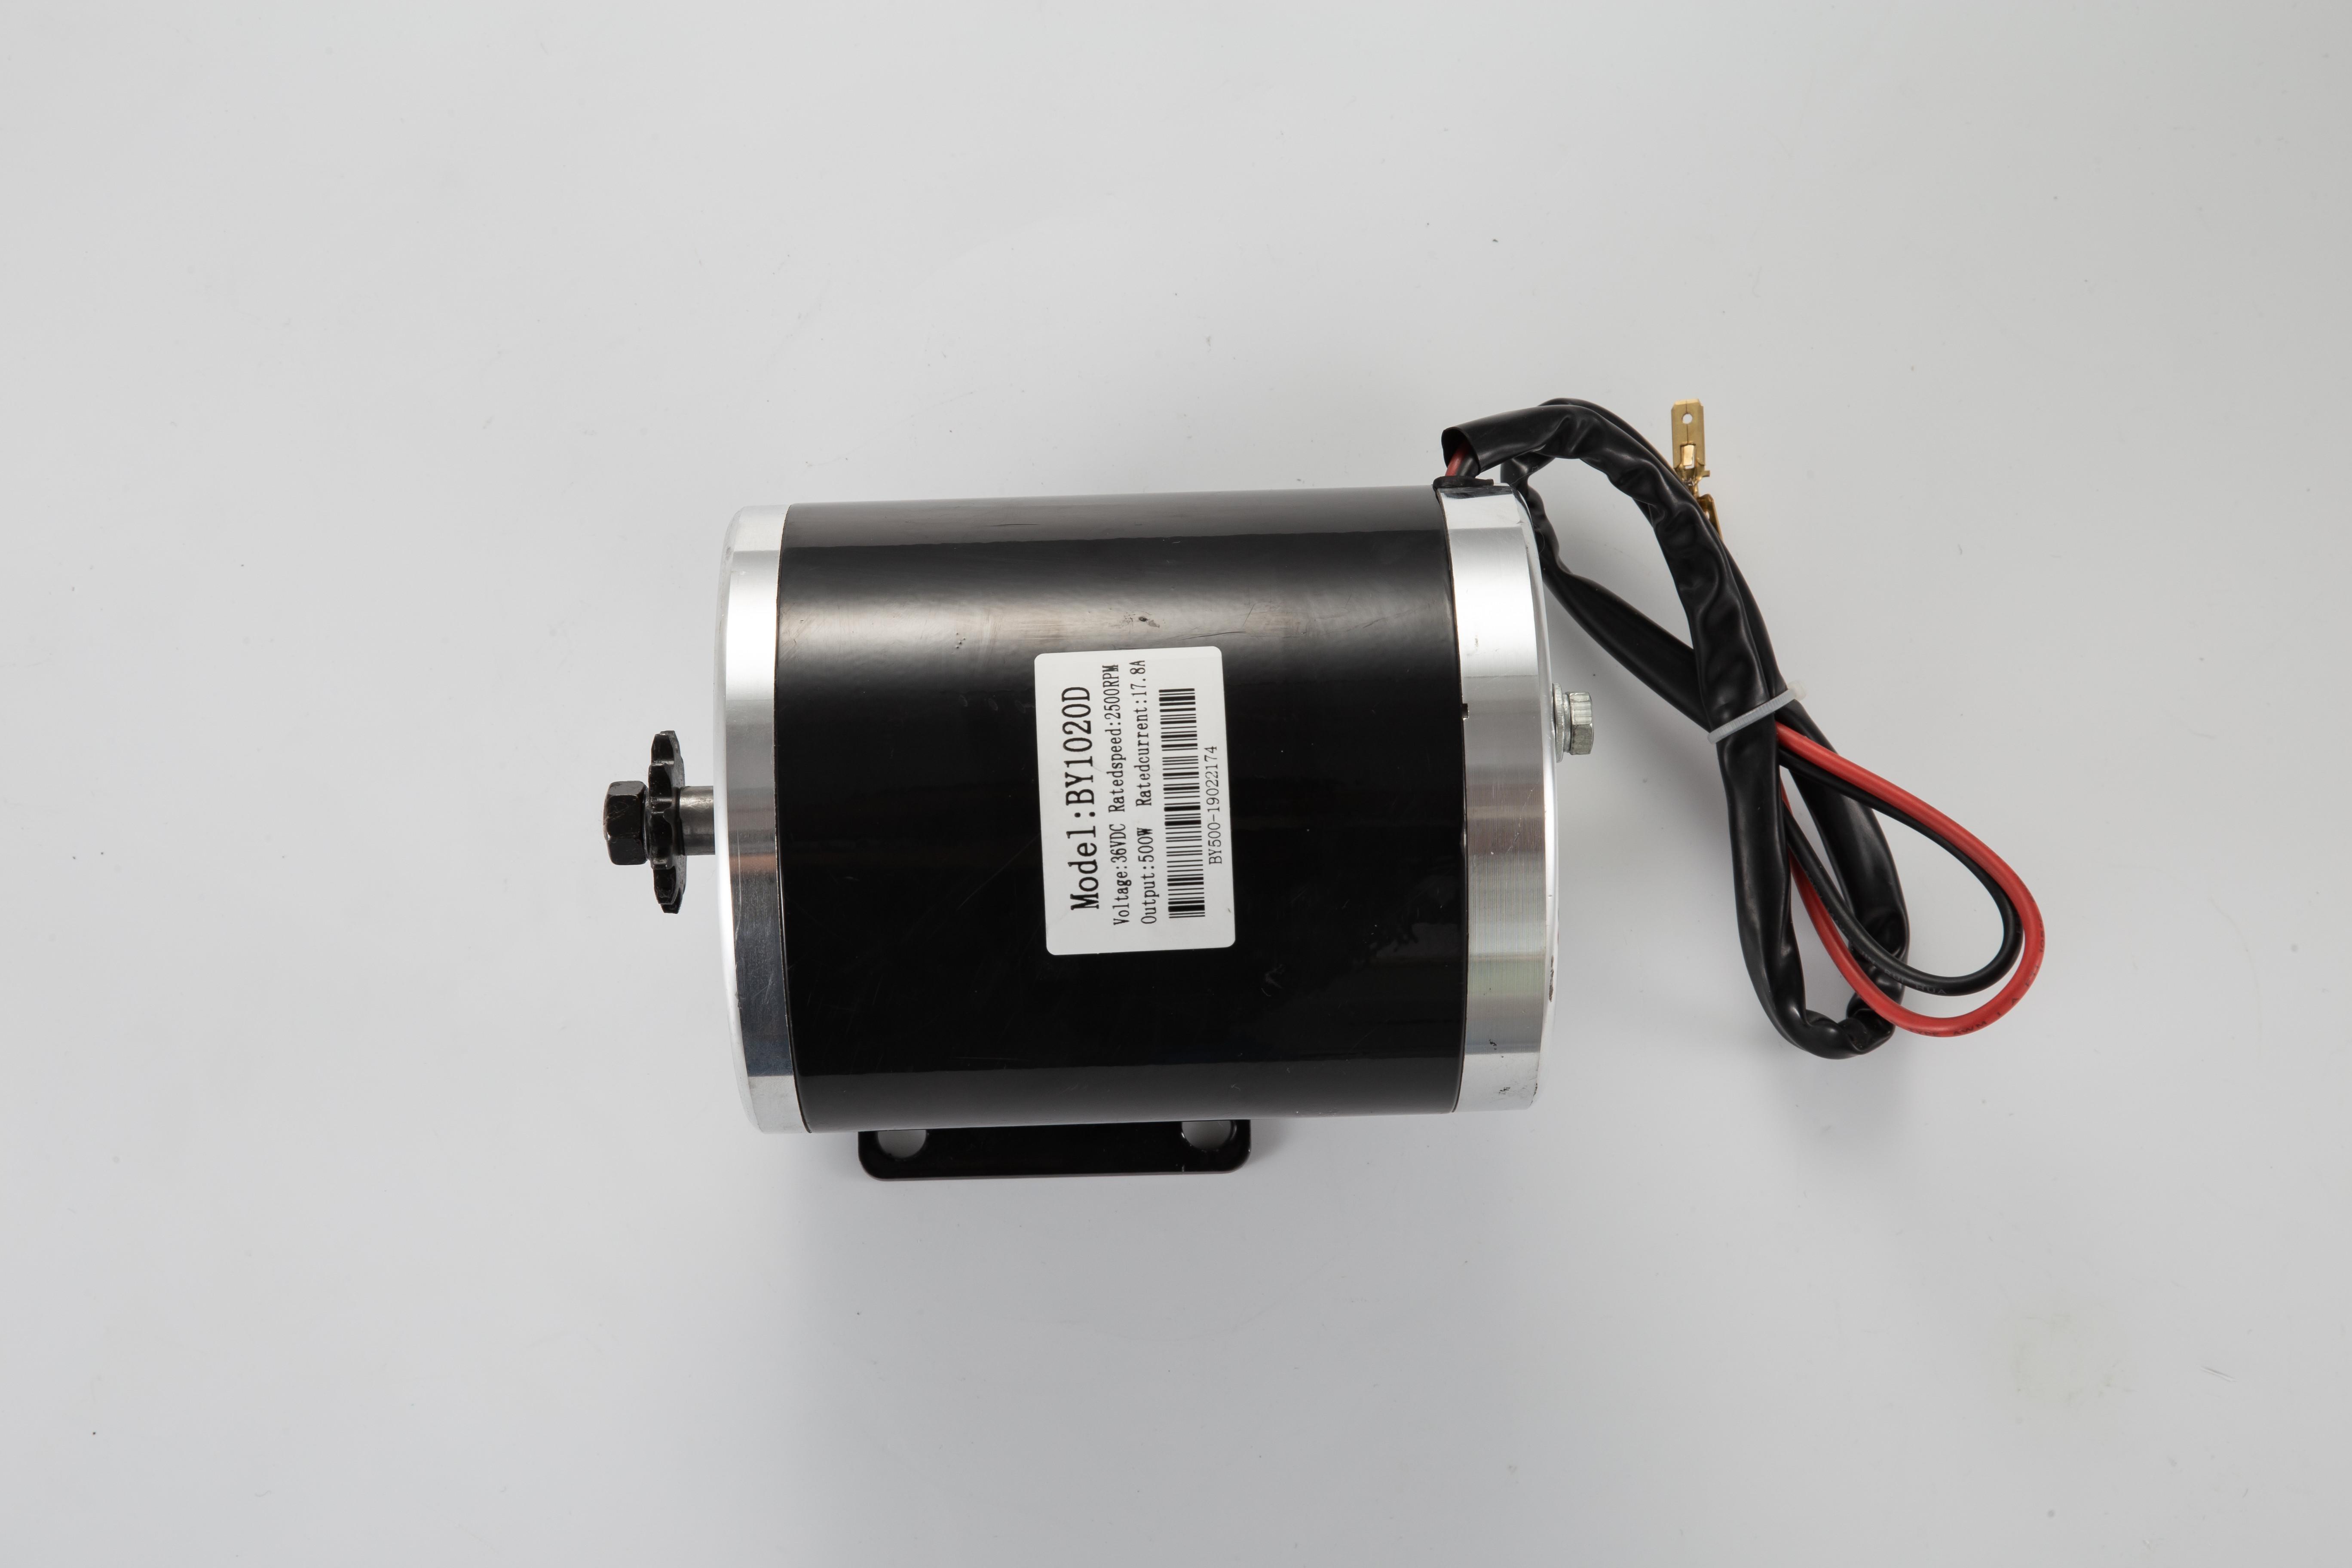 36v-Electric-Motor-controller-throttle-kit-f-Scooter-E-Scooter-ATV-Permanent thumbnail 46